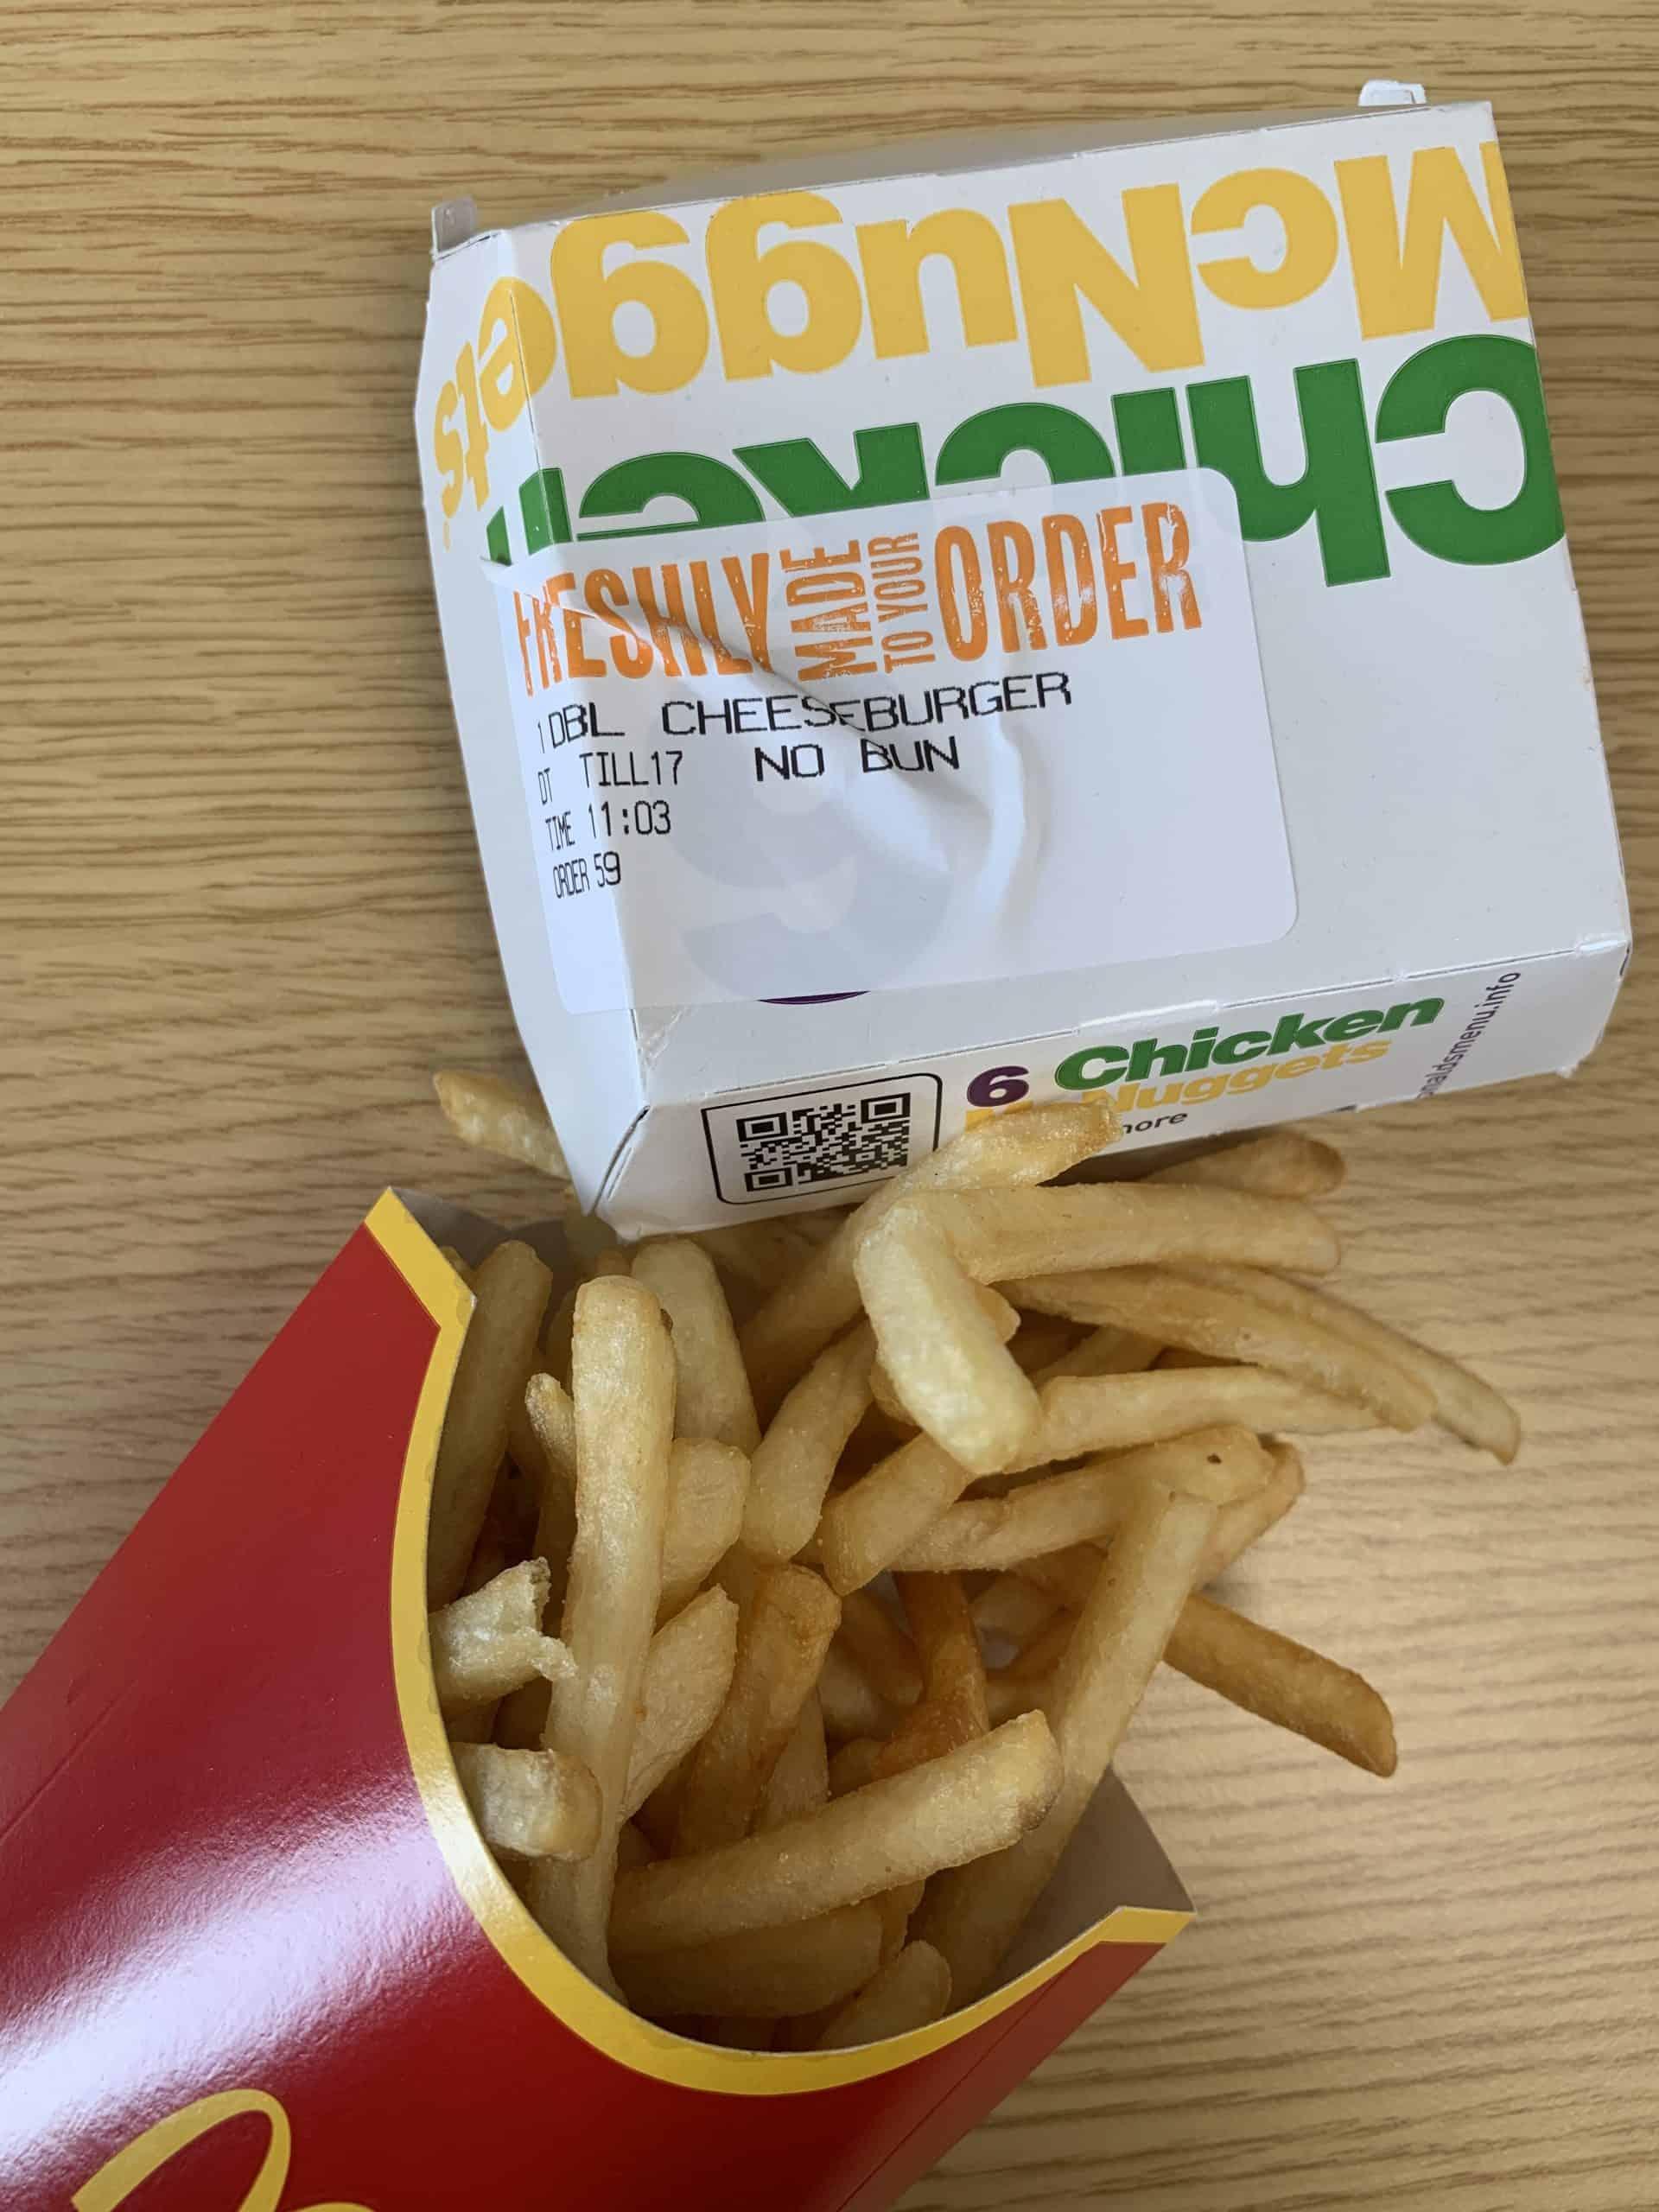 mcdonald's gluten free in the uk